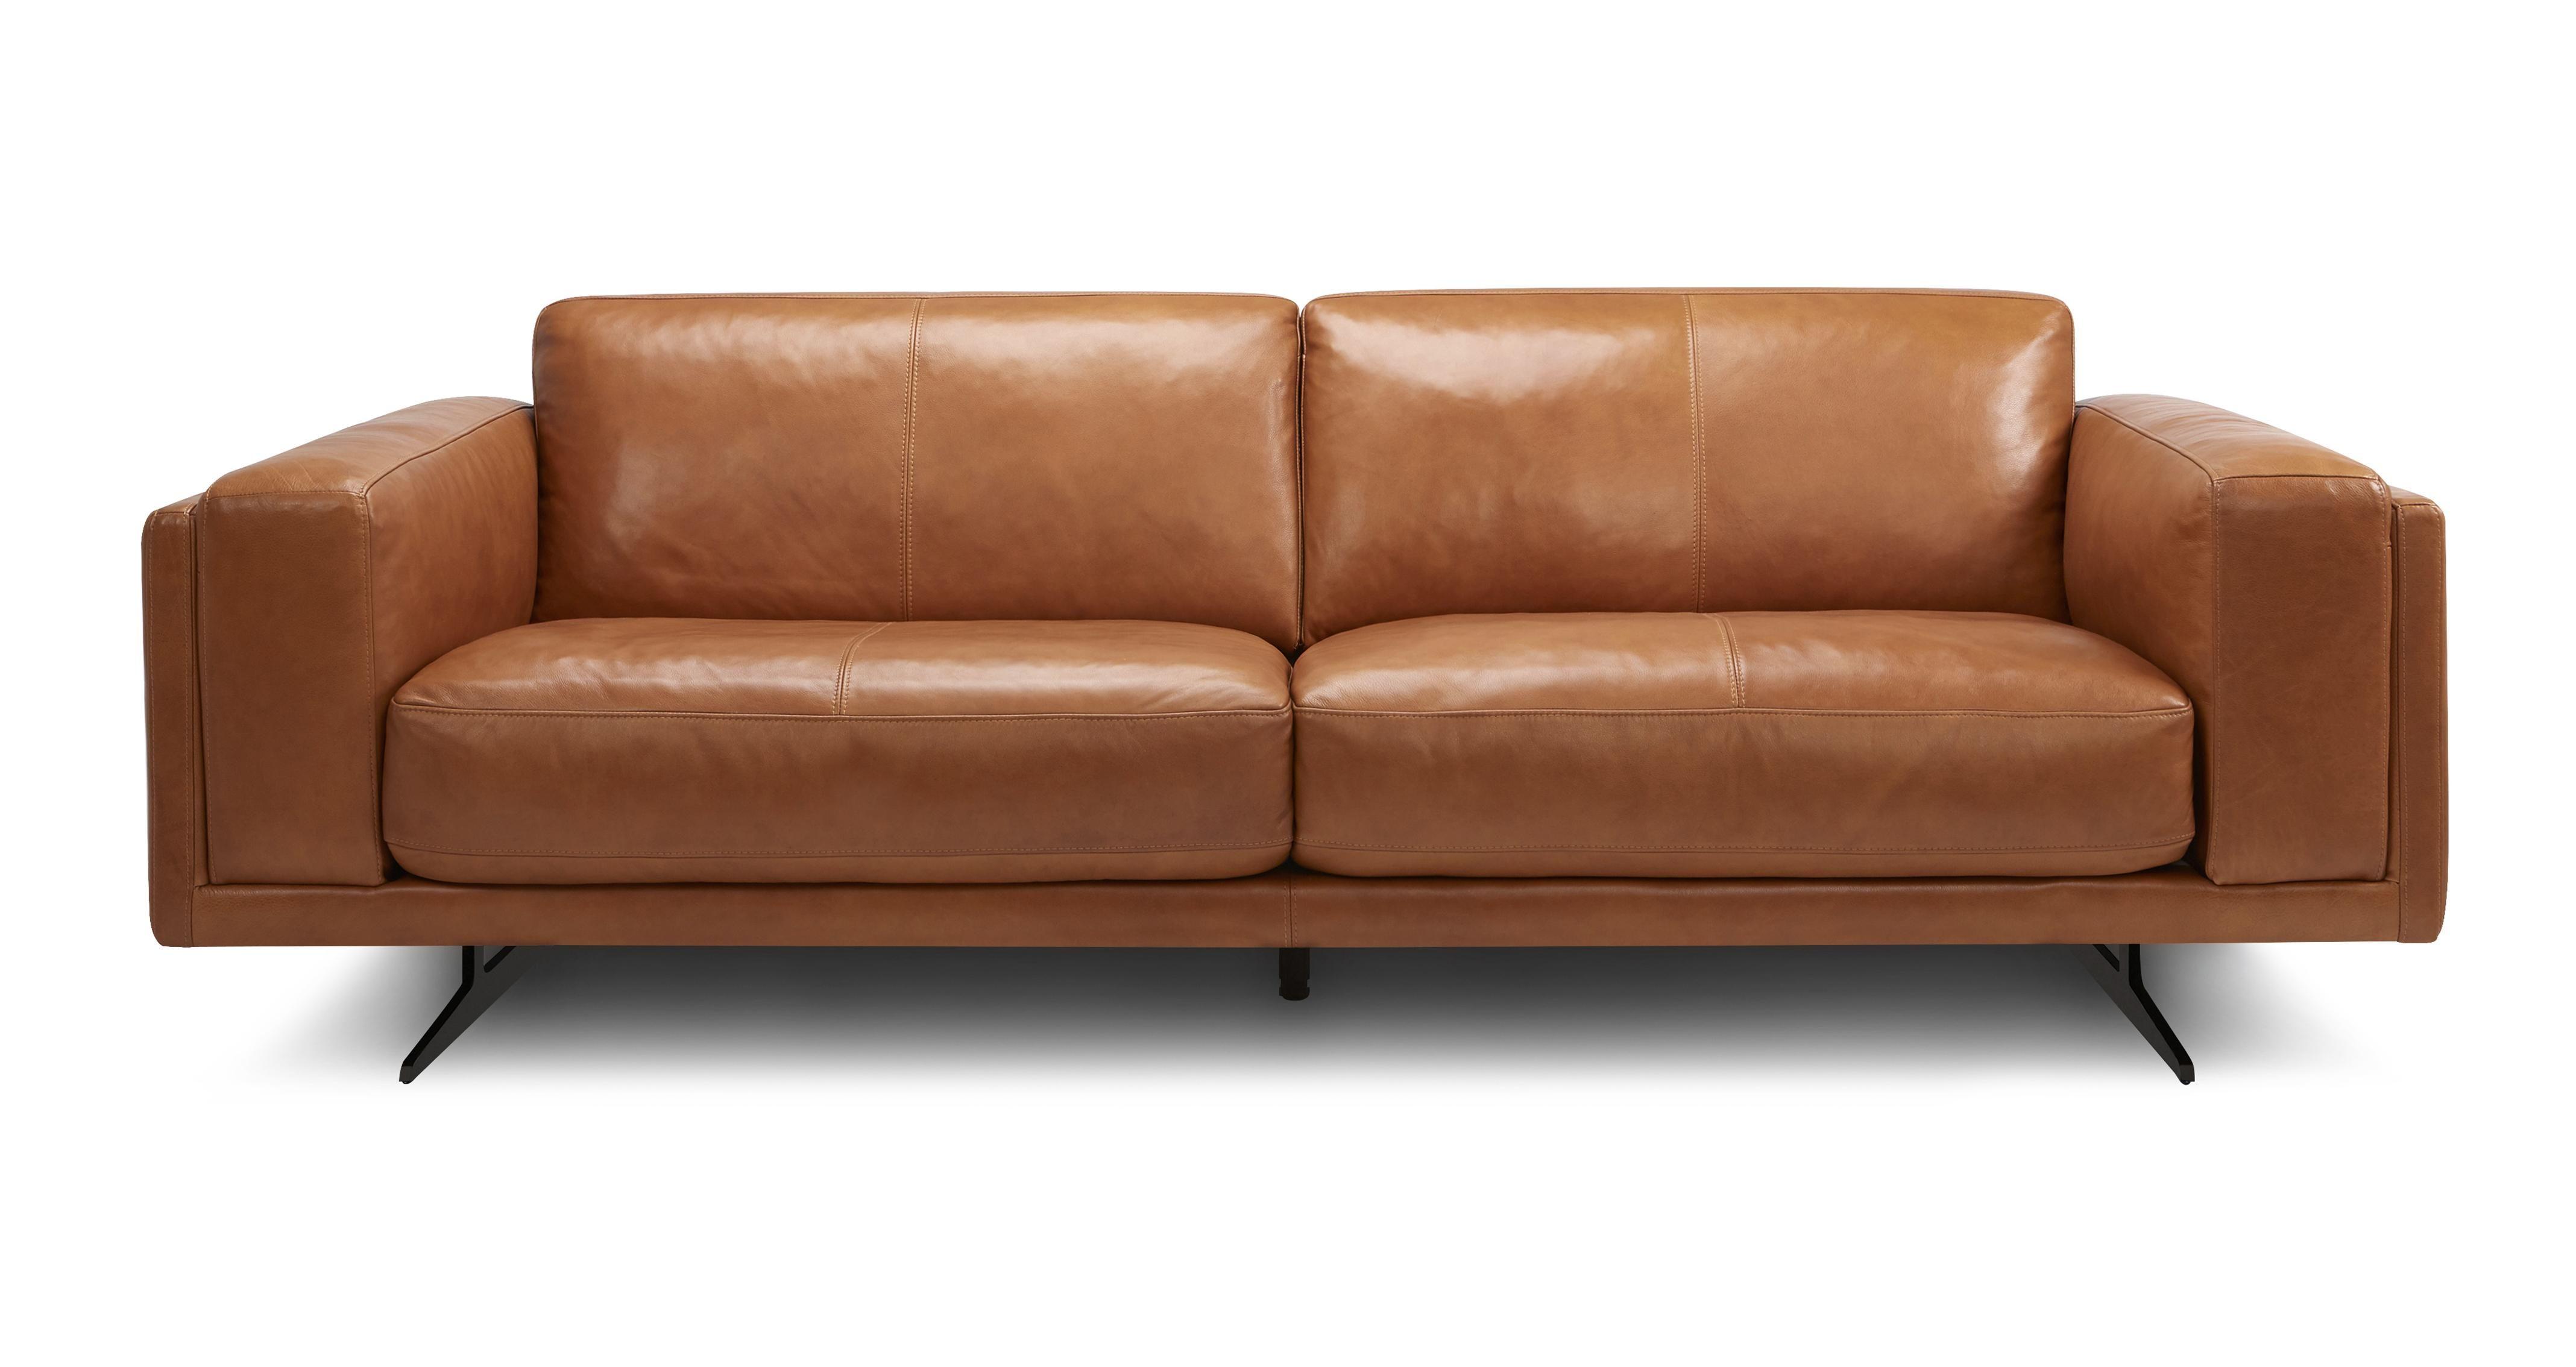 Dfs 3 Seater Sofa Hackney In 2020 Seater Sofa 3 Seater Sofa Tan Leather Sofas